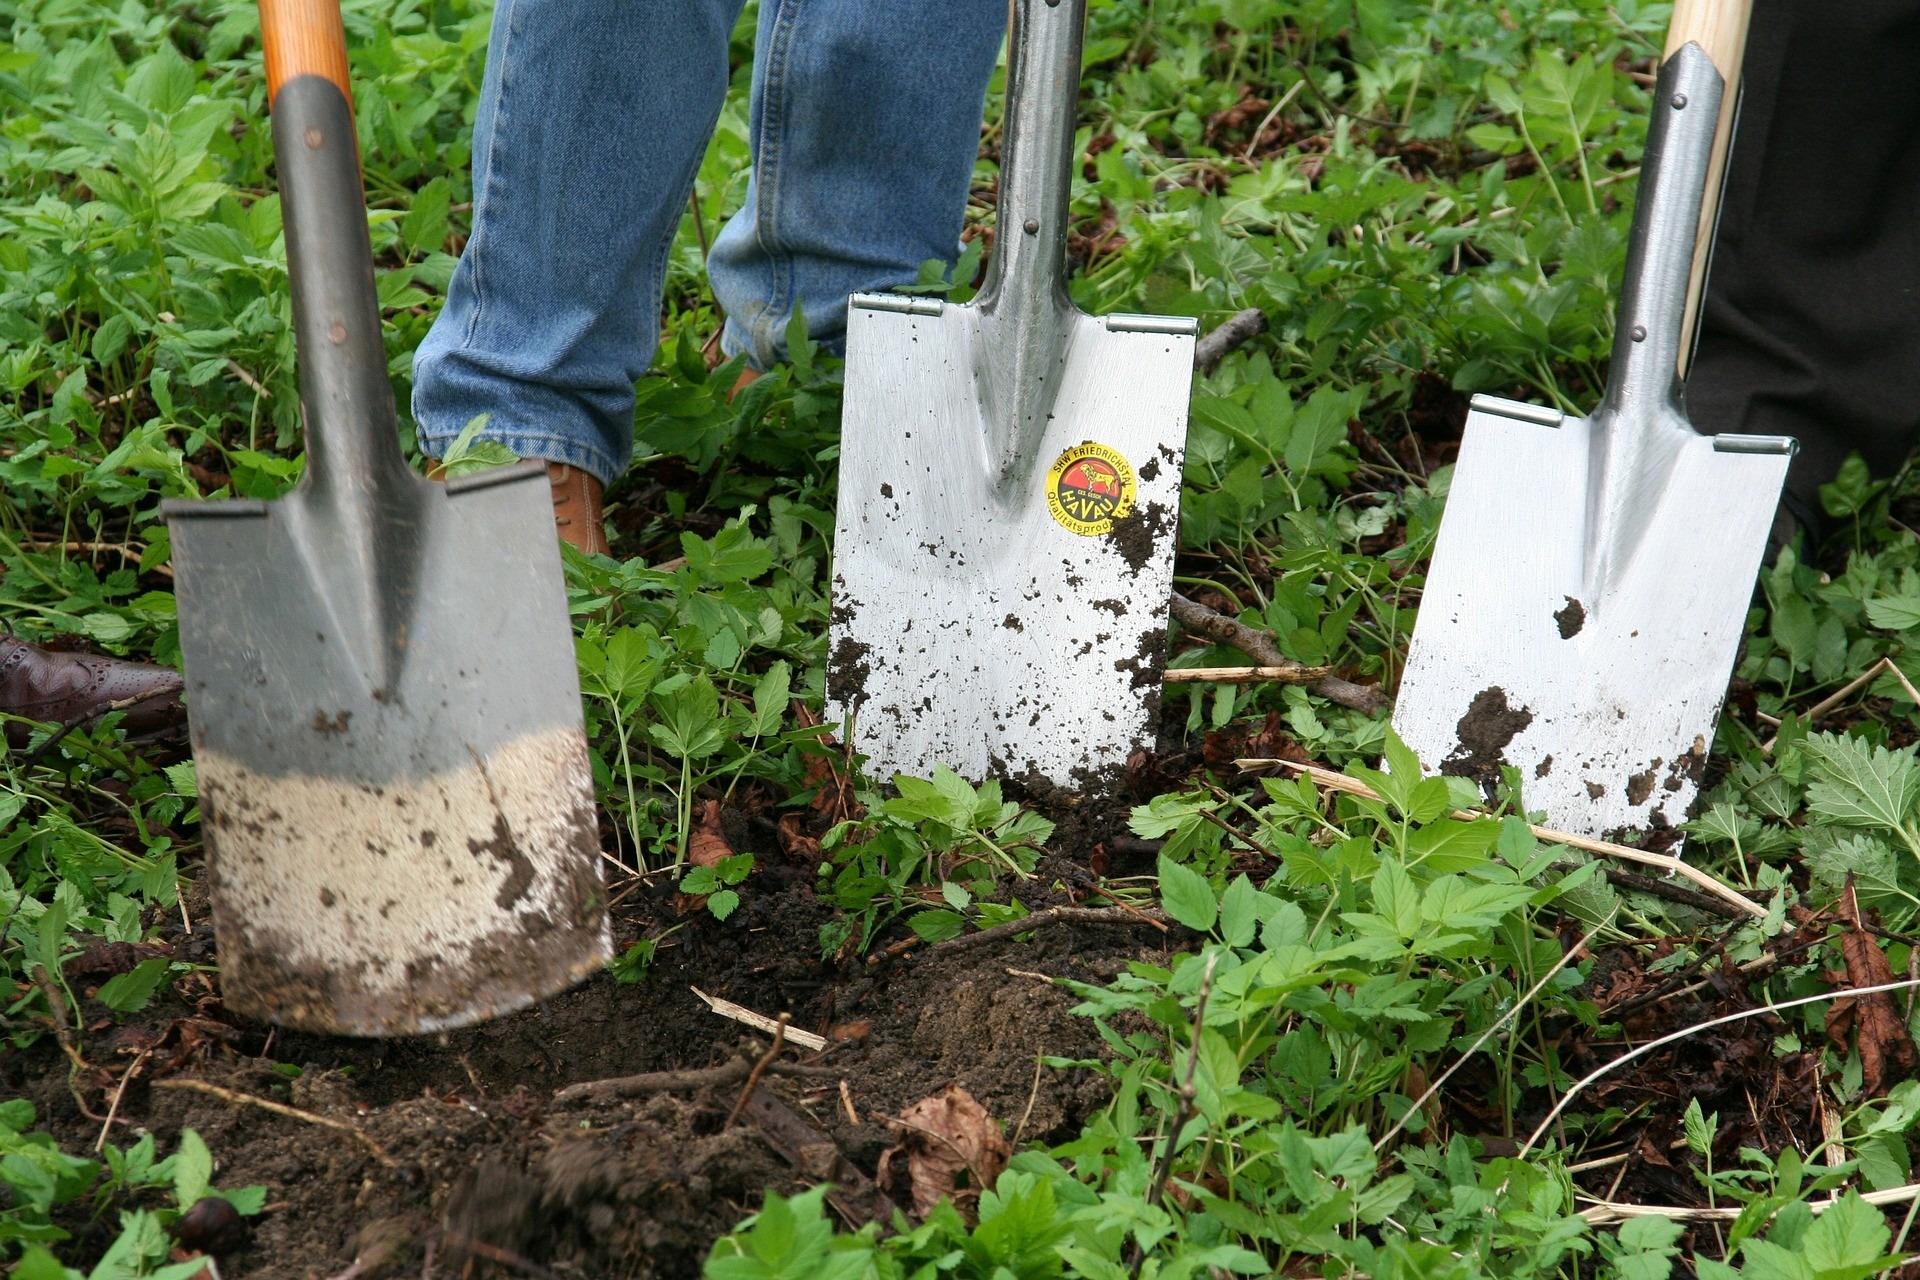 Sac à culture de pomme de terre hors sol